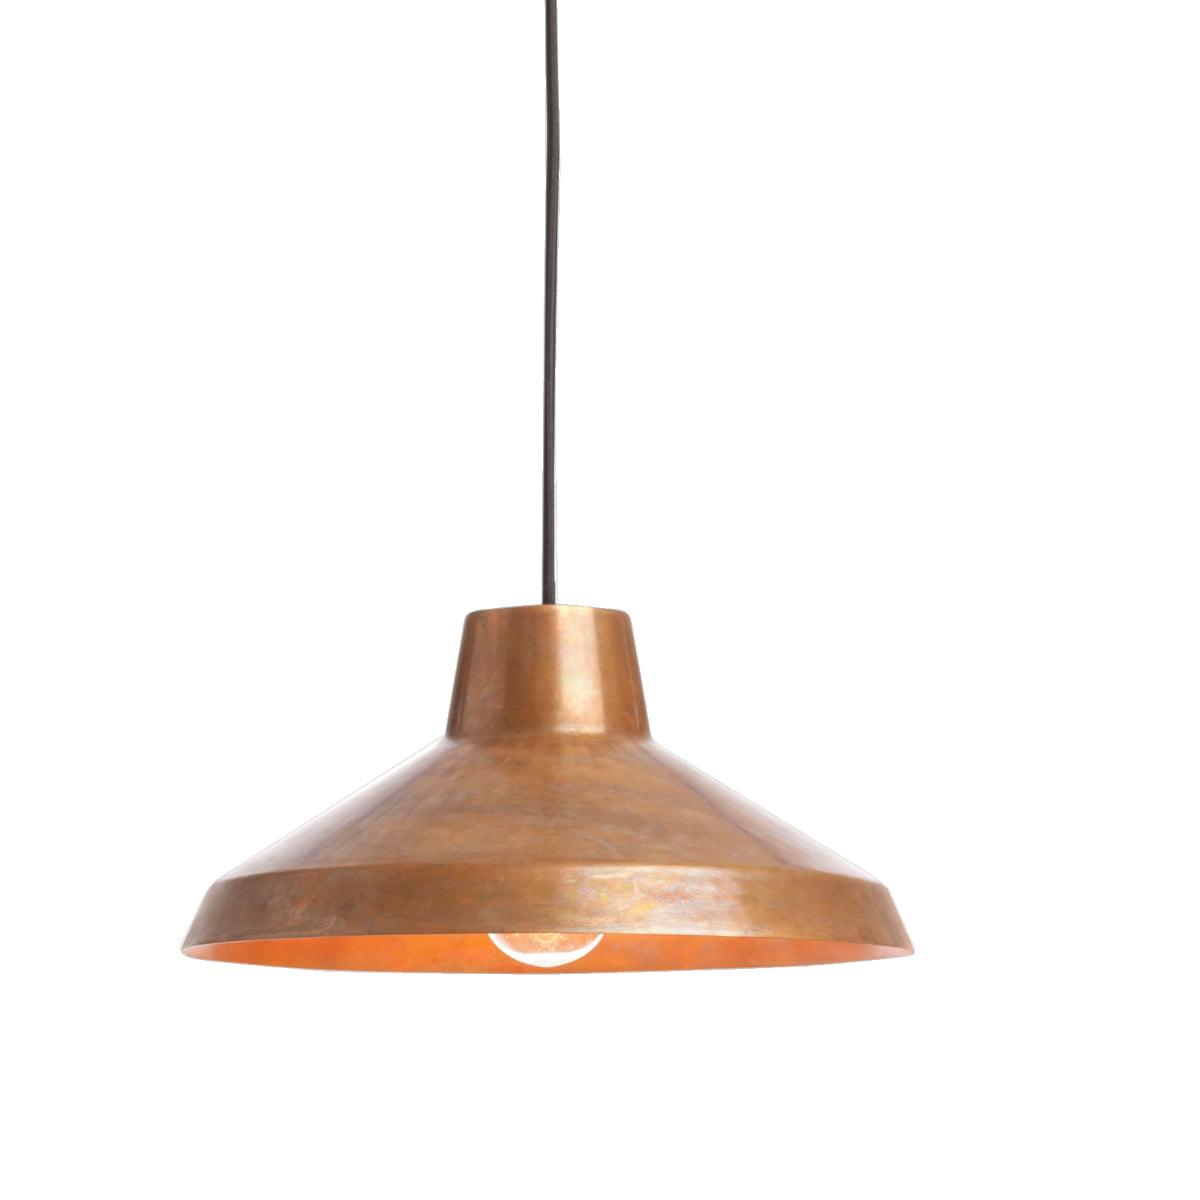 small pendant lighting. Northernlighting - Evergreen Pendant Lamp. Northern Pendelleuchte Small Lighting